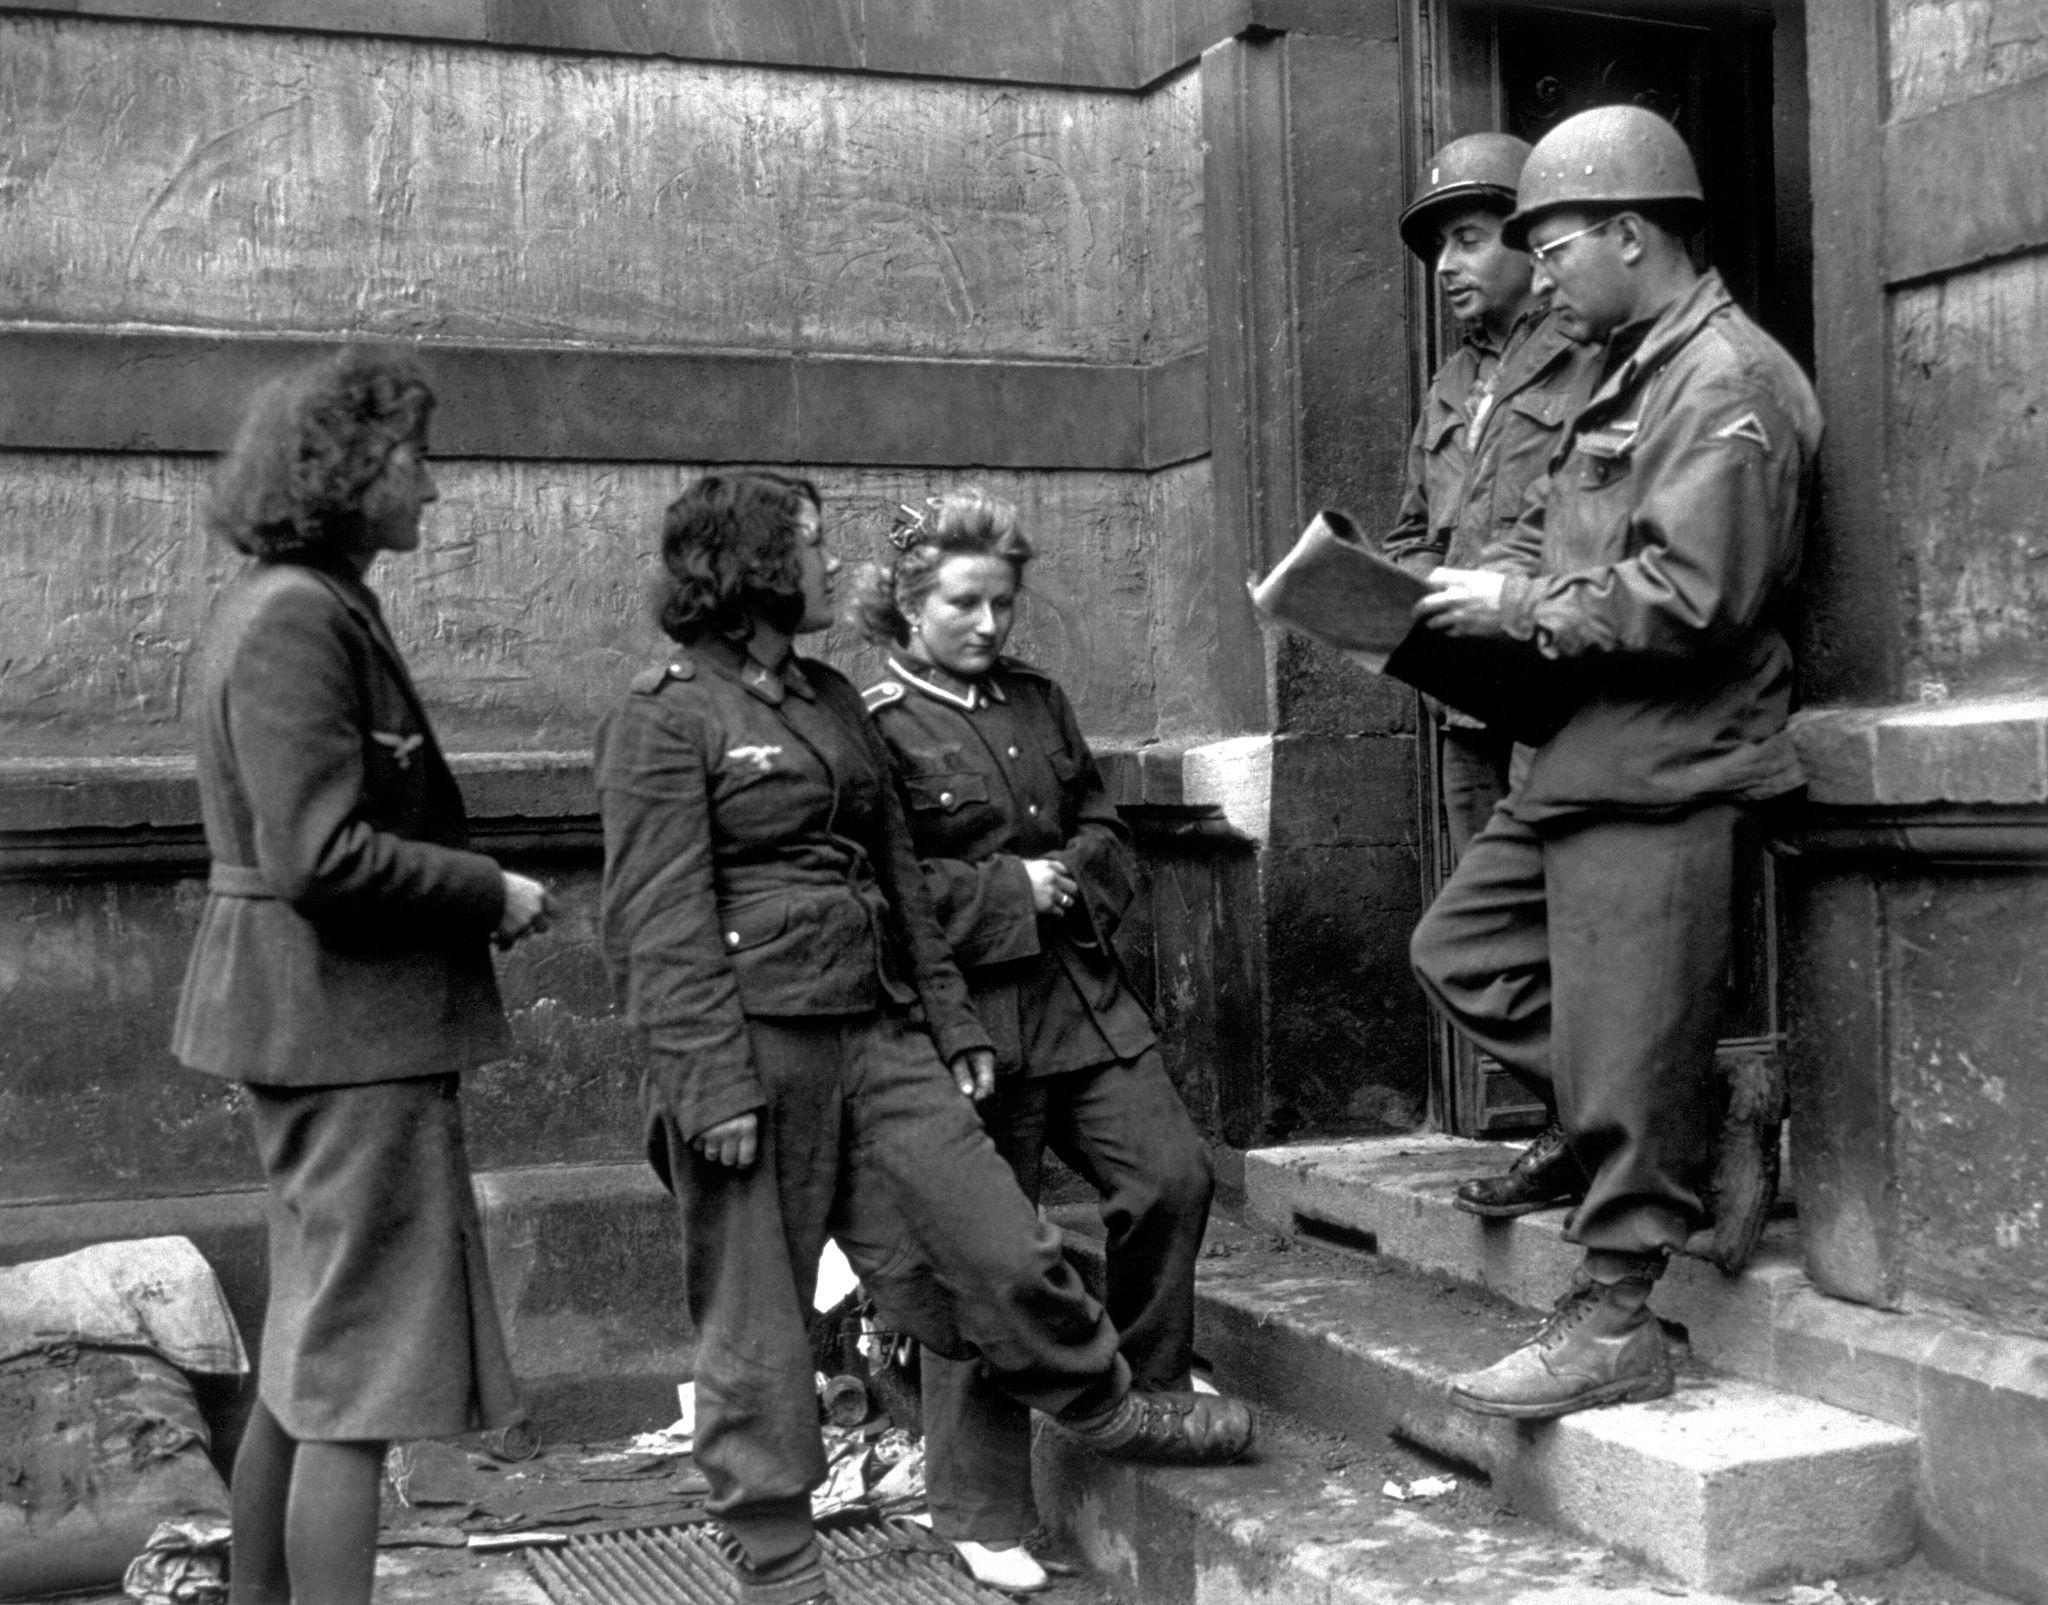 Us Officers Speak With Women In German Uniforms Pows